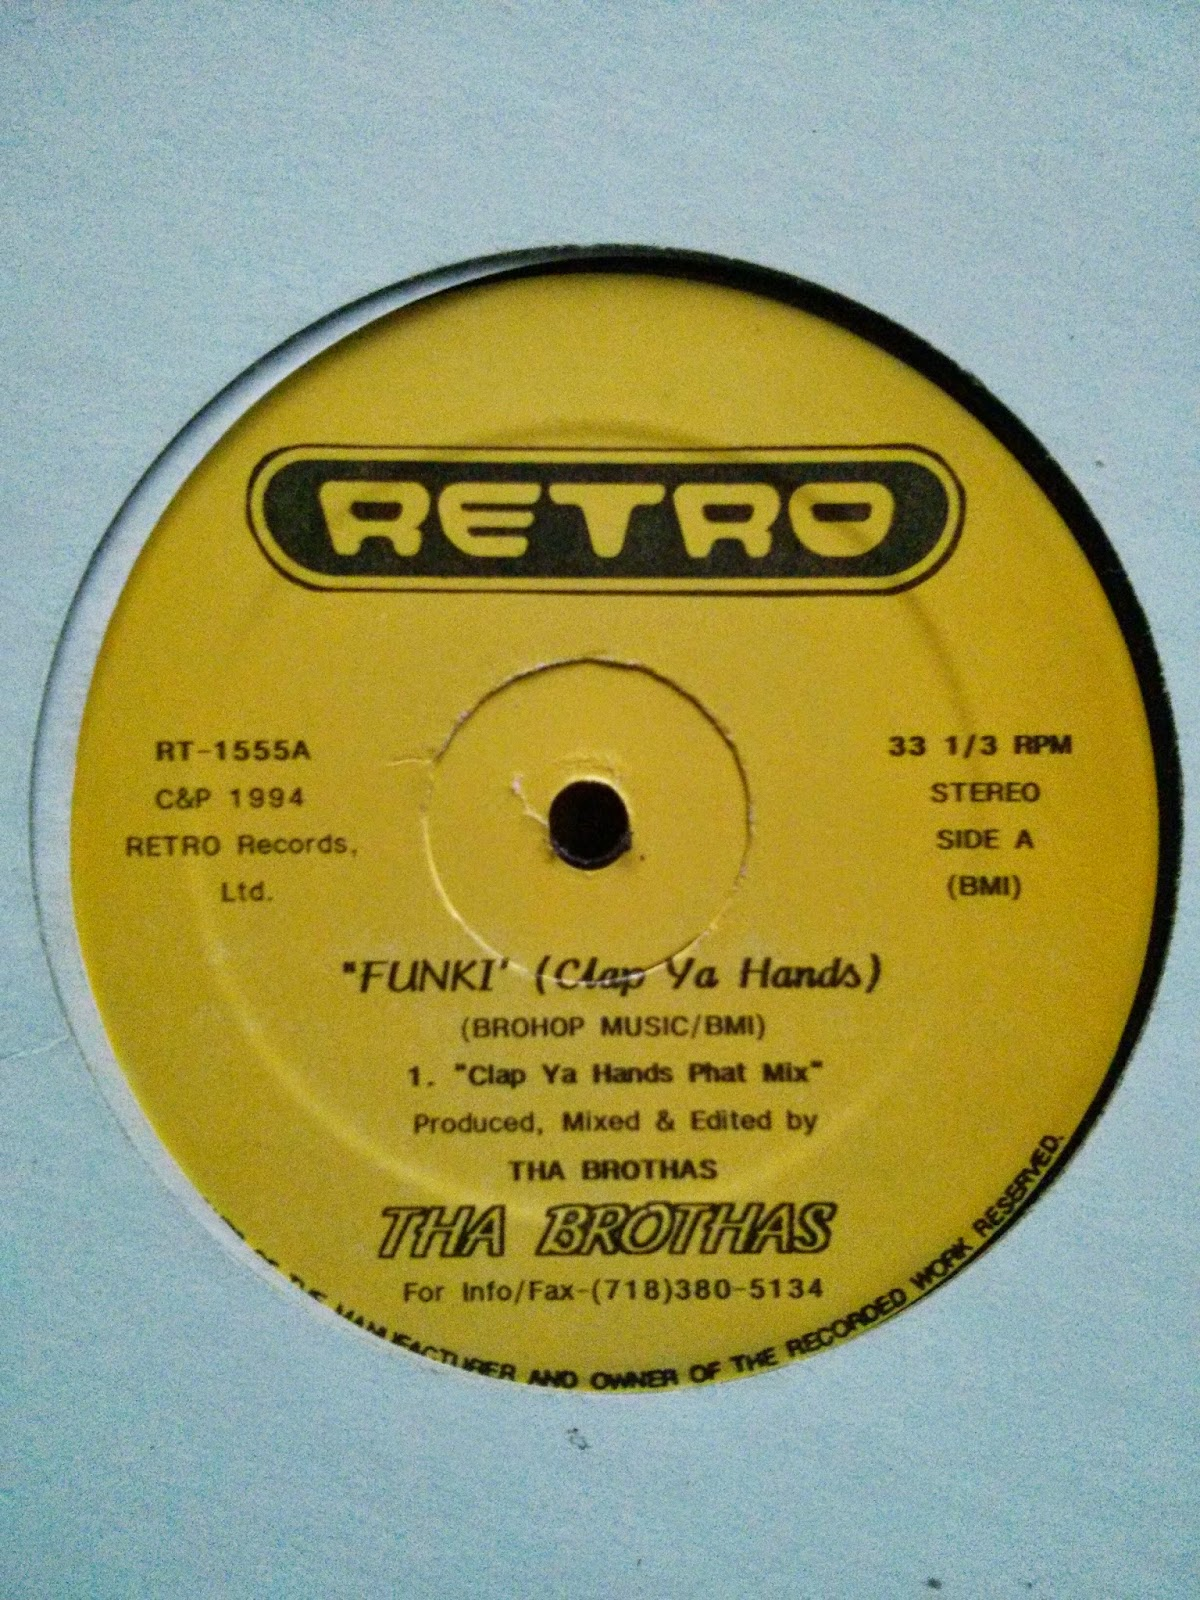 Tha Brothas - (No Date) Funky (Clap Ya Hands) (VLS) (320)